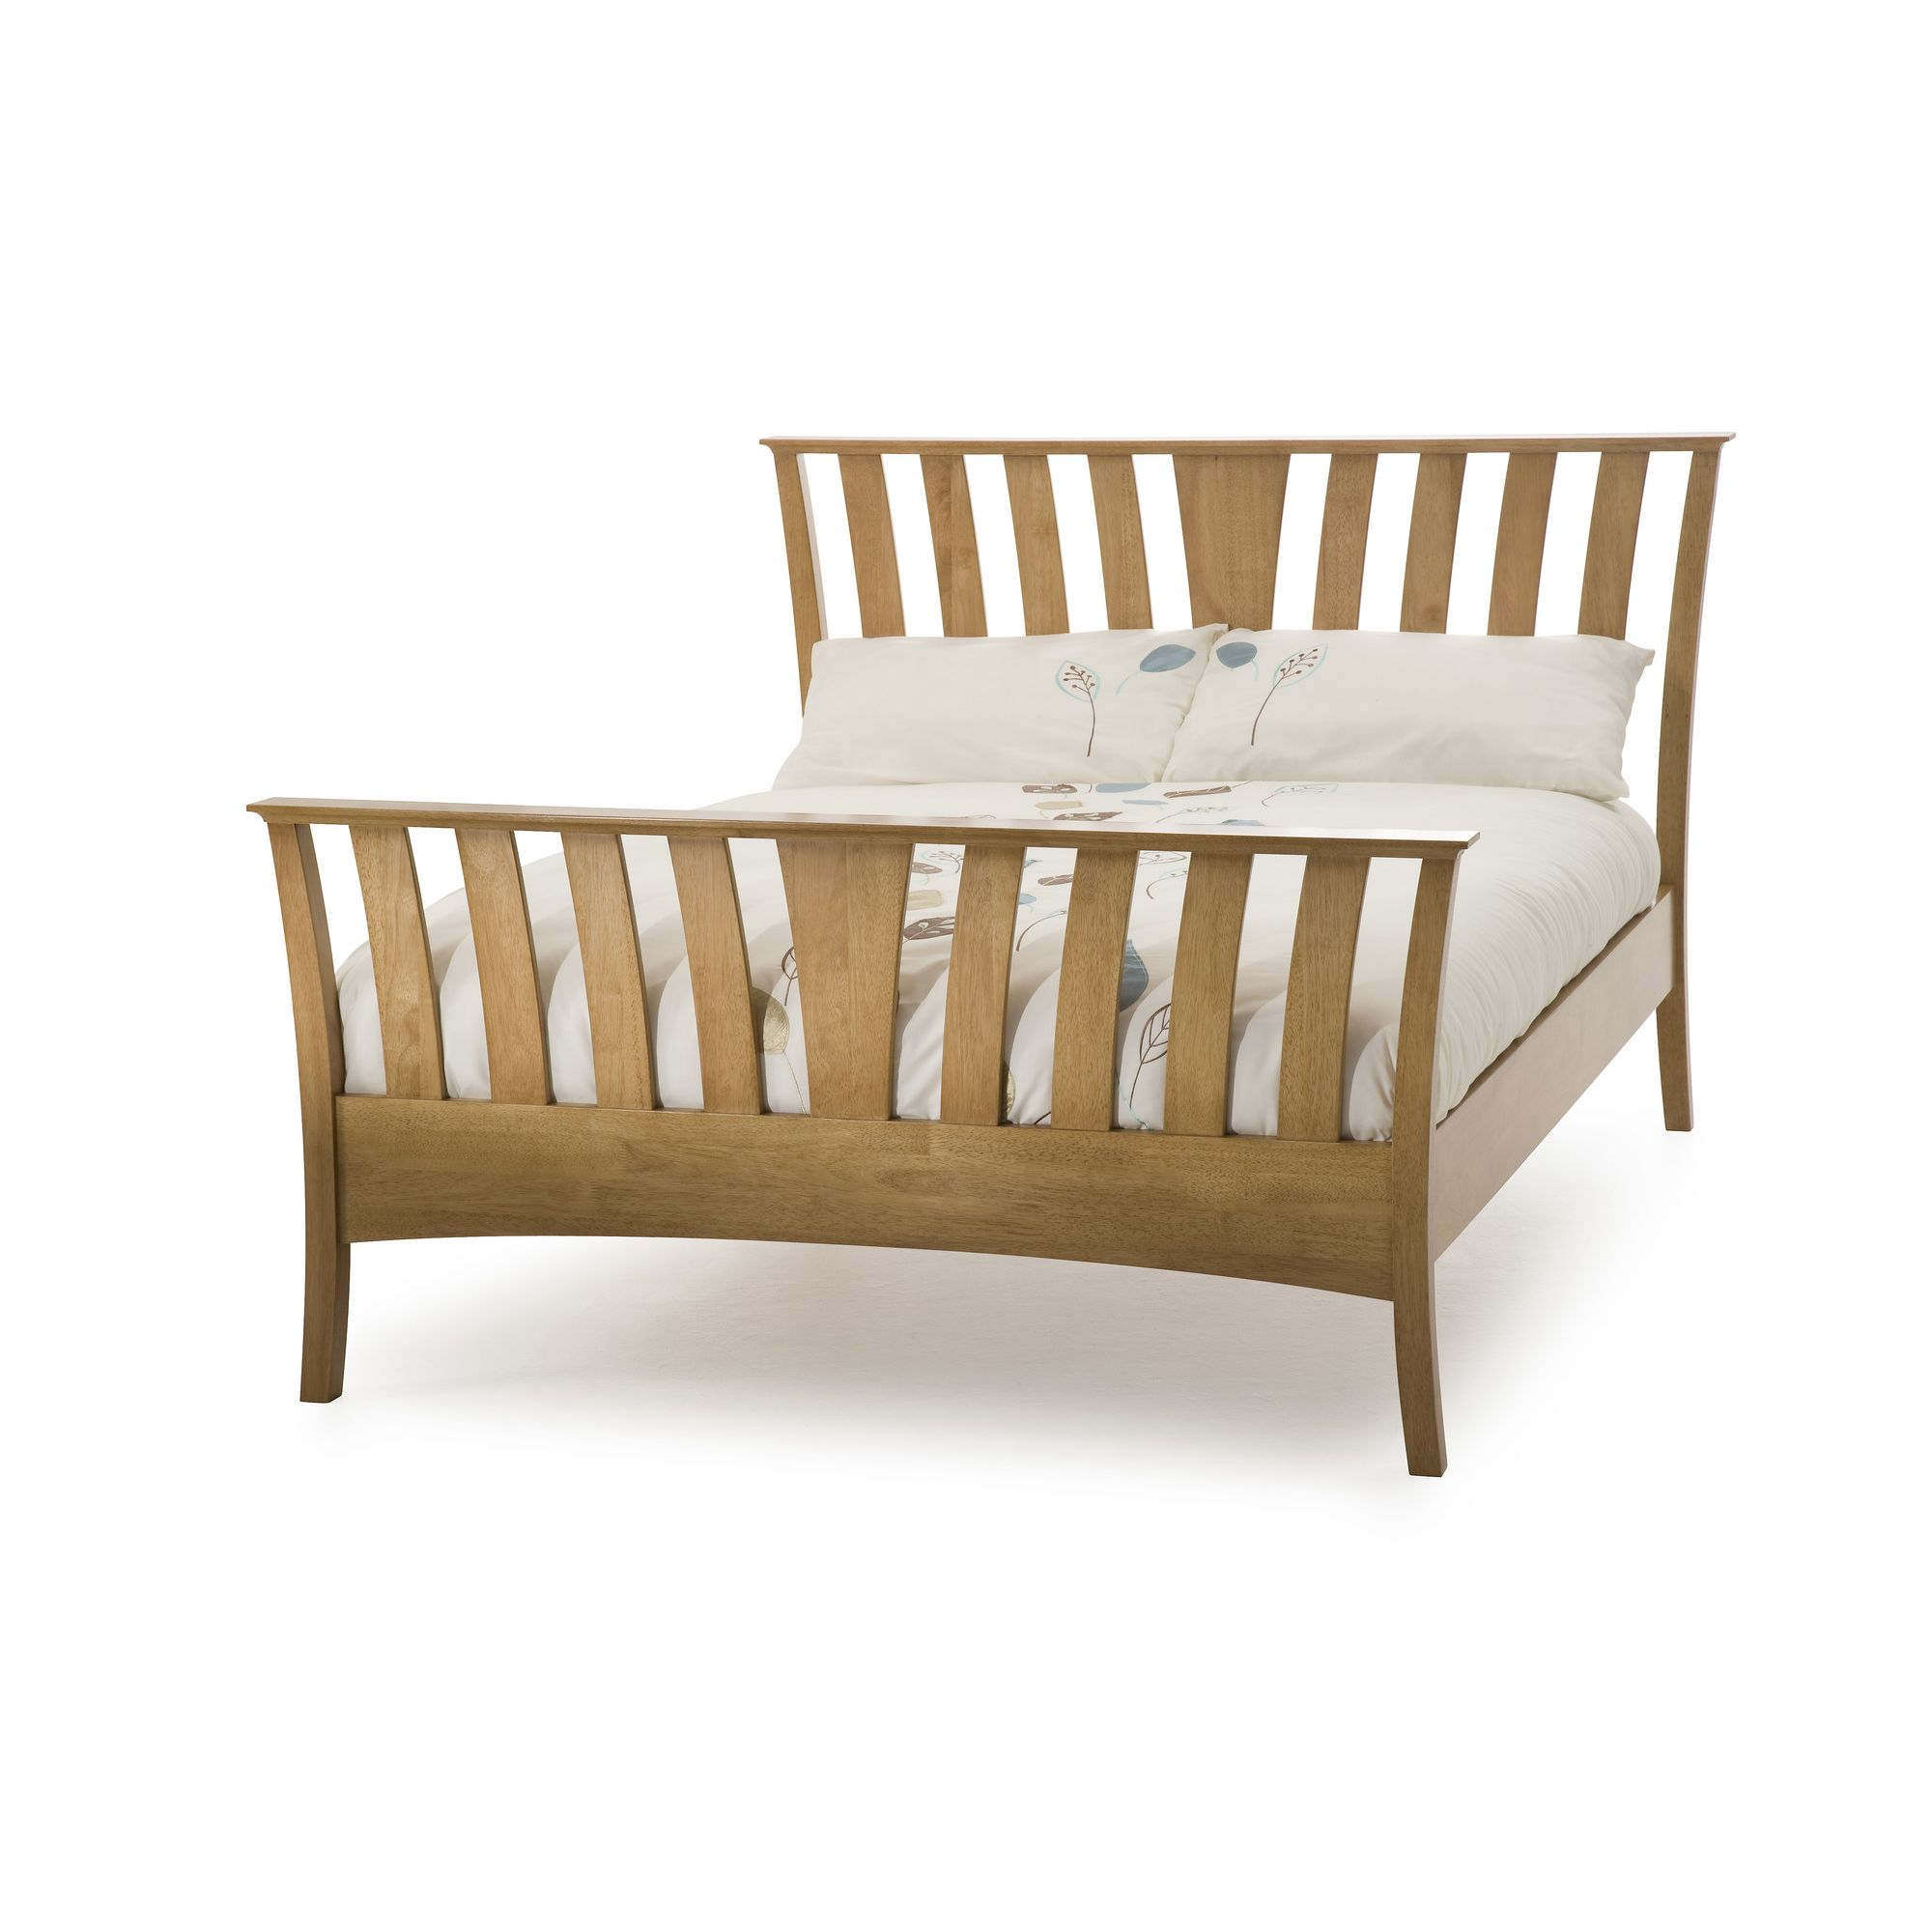 Serene Furnishings Ordelia Bed - Honey Oak - Double at Tesco Direct